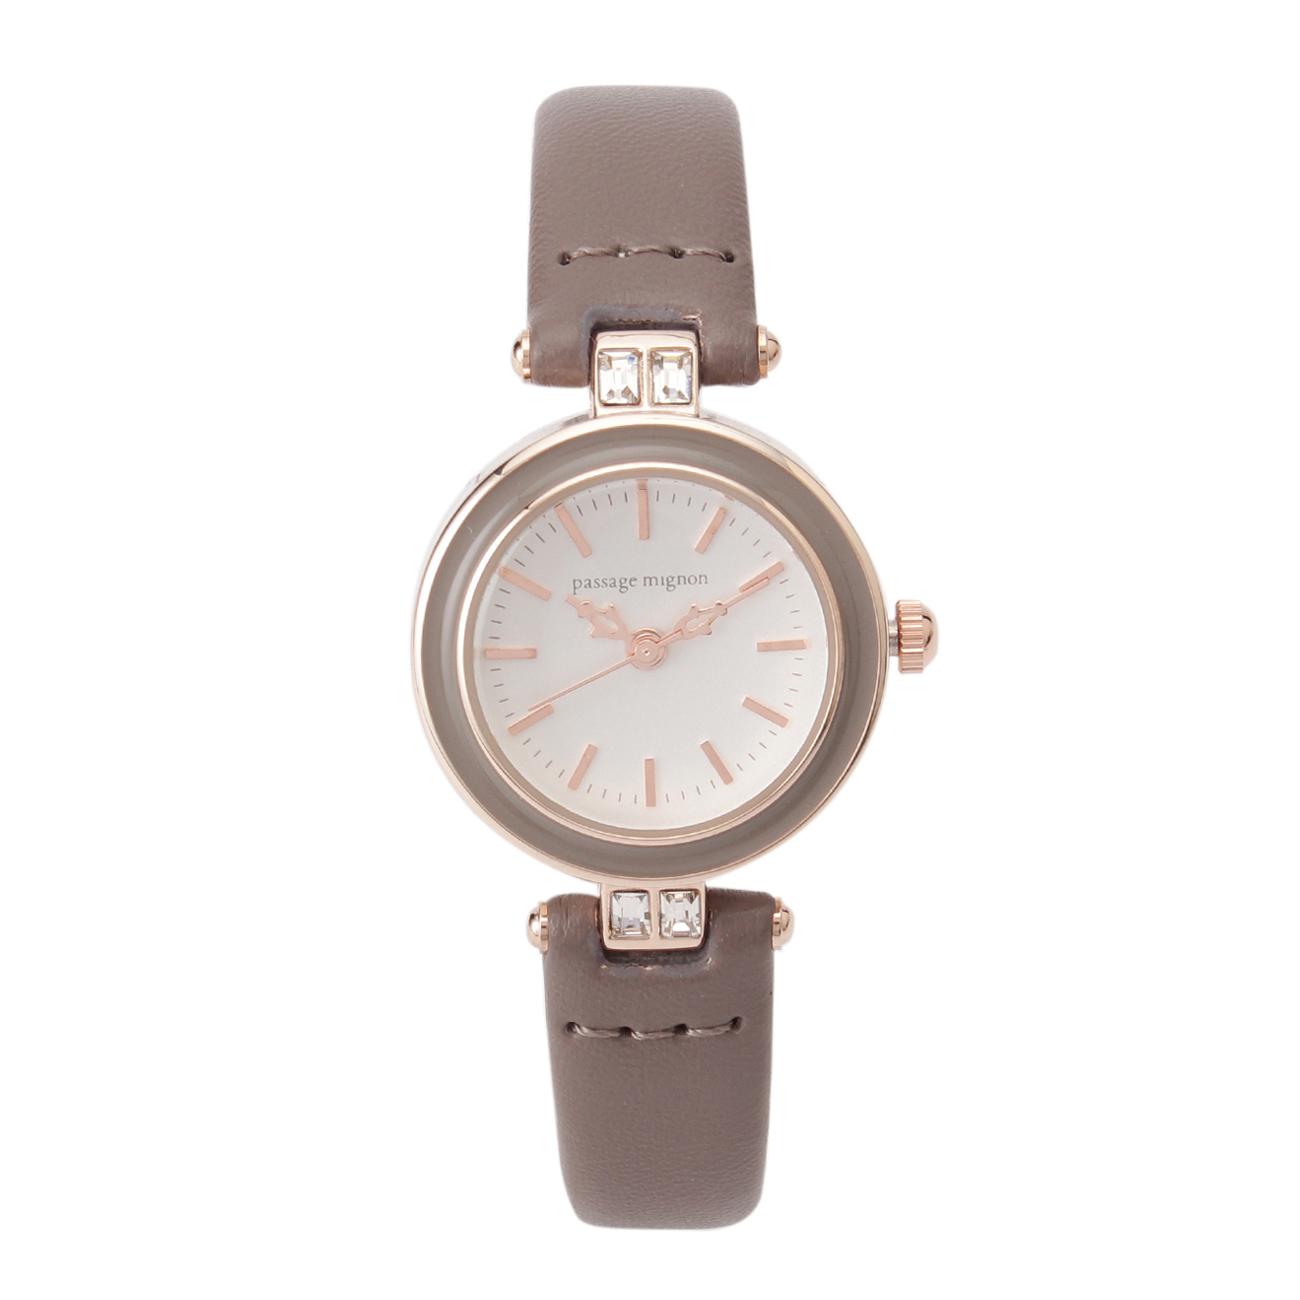 【passage mignon (パサージュ ミニョン)】エポサークルフレーム腕時計レディース 雑貨|腕時計 サンドベージュ